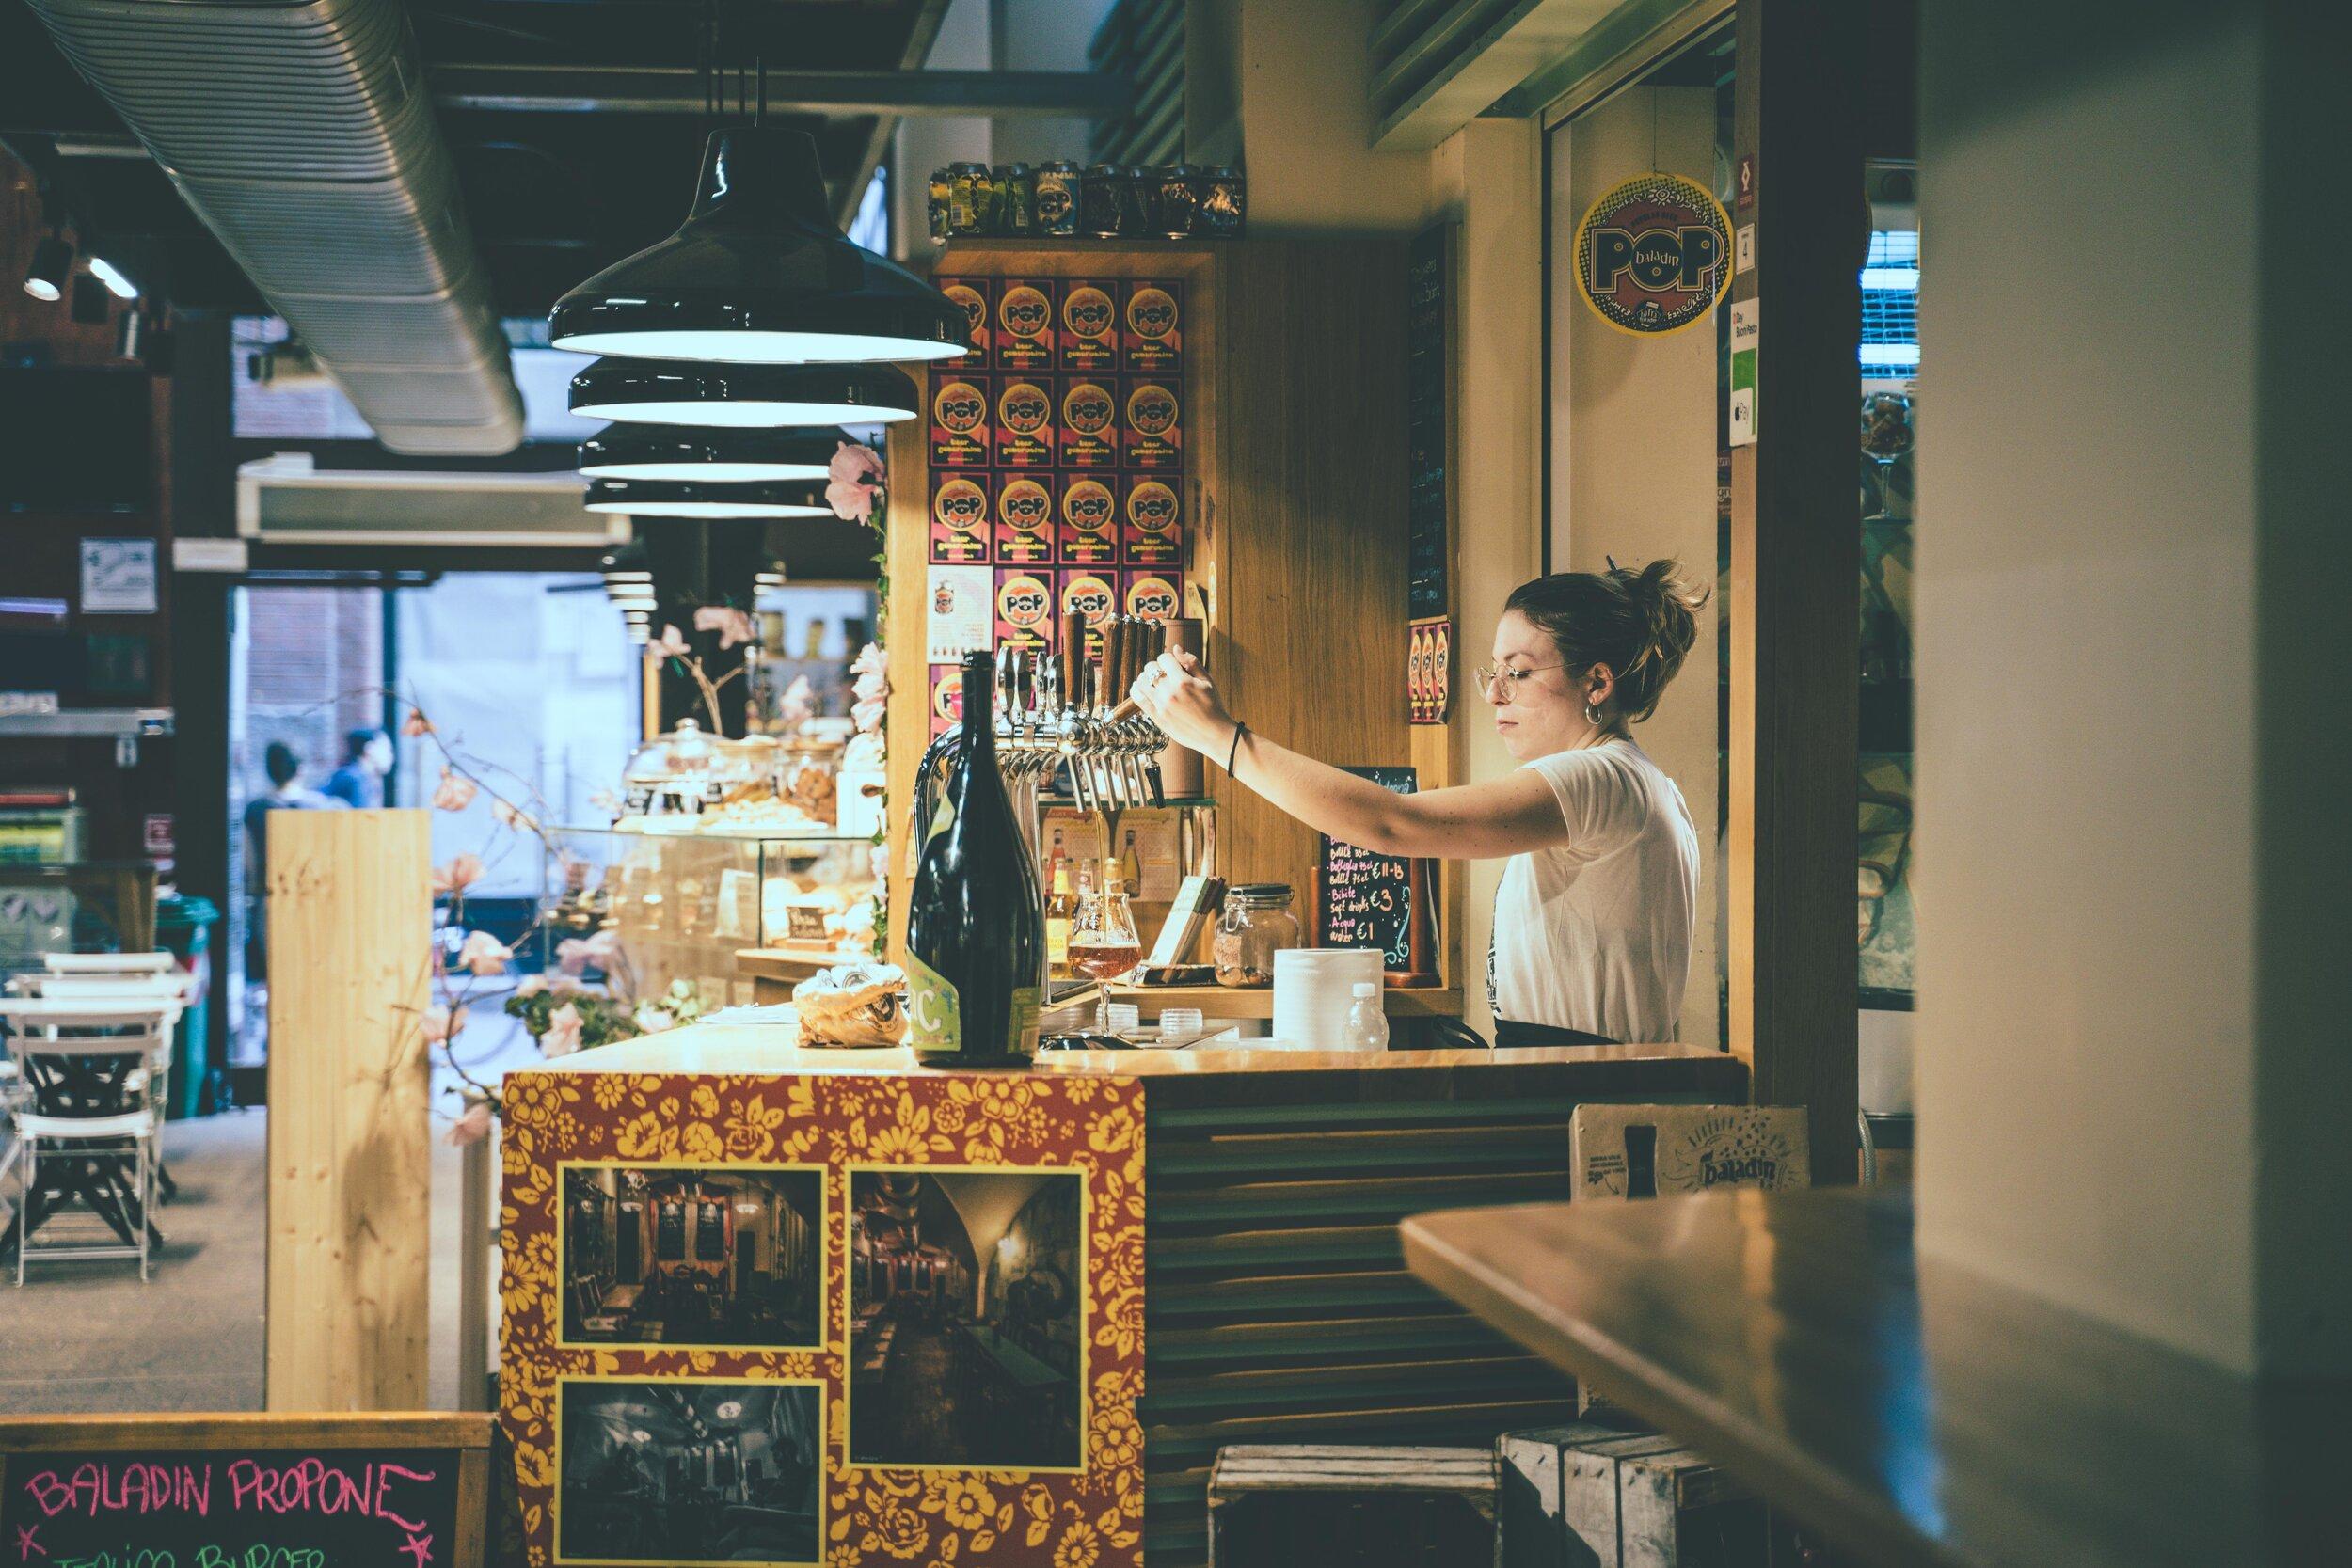 lady in market pulling beer on tap.jpg